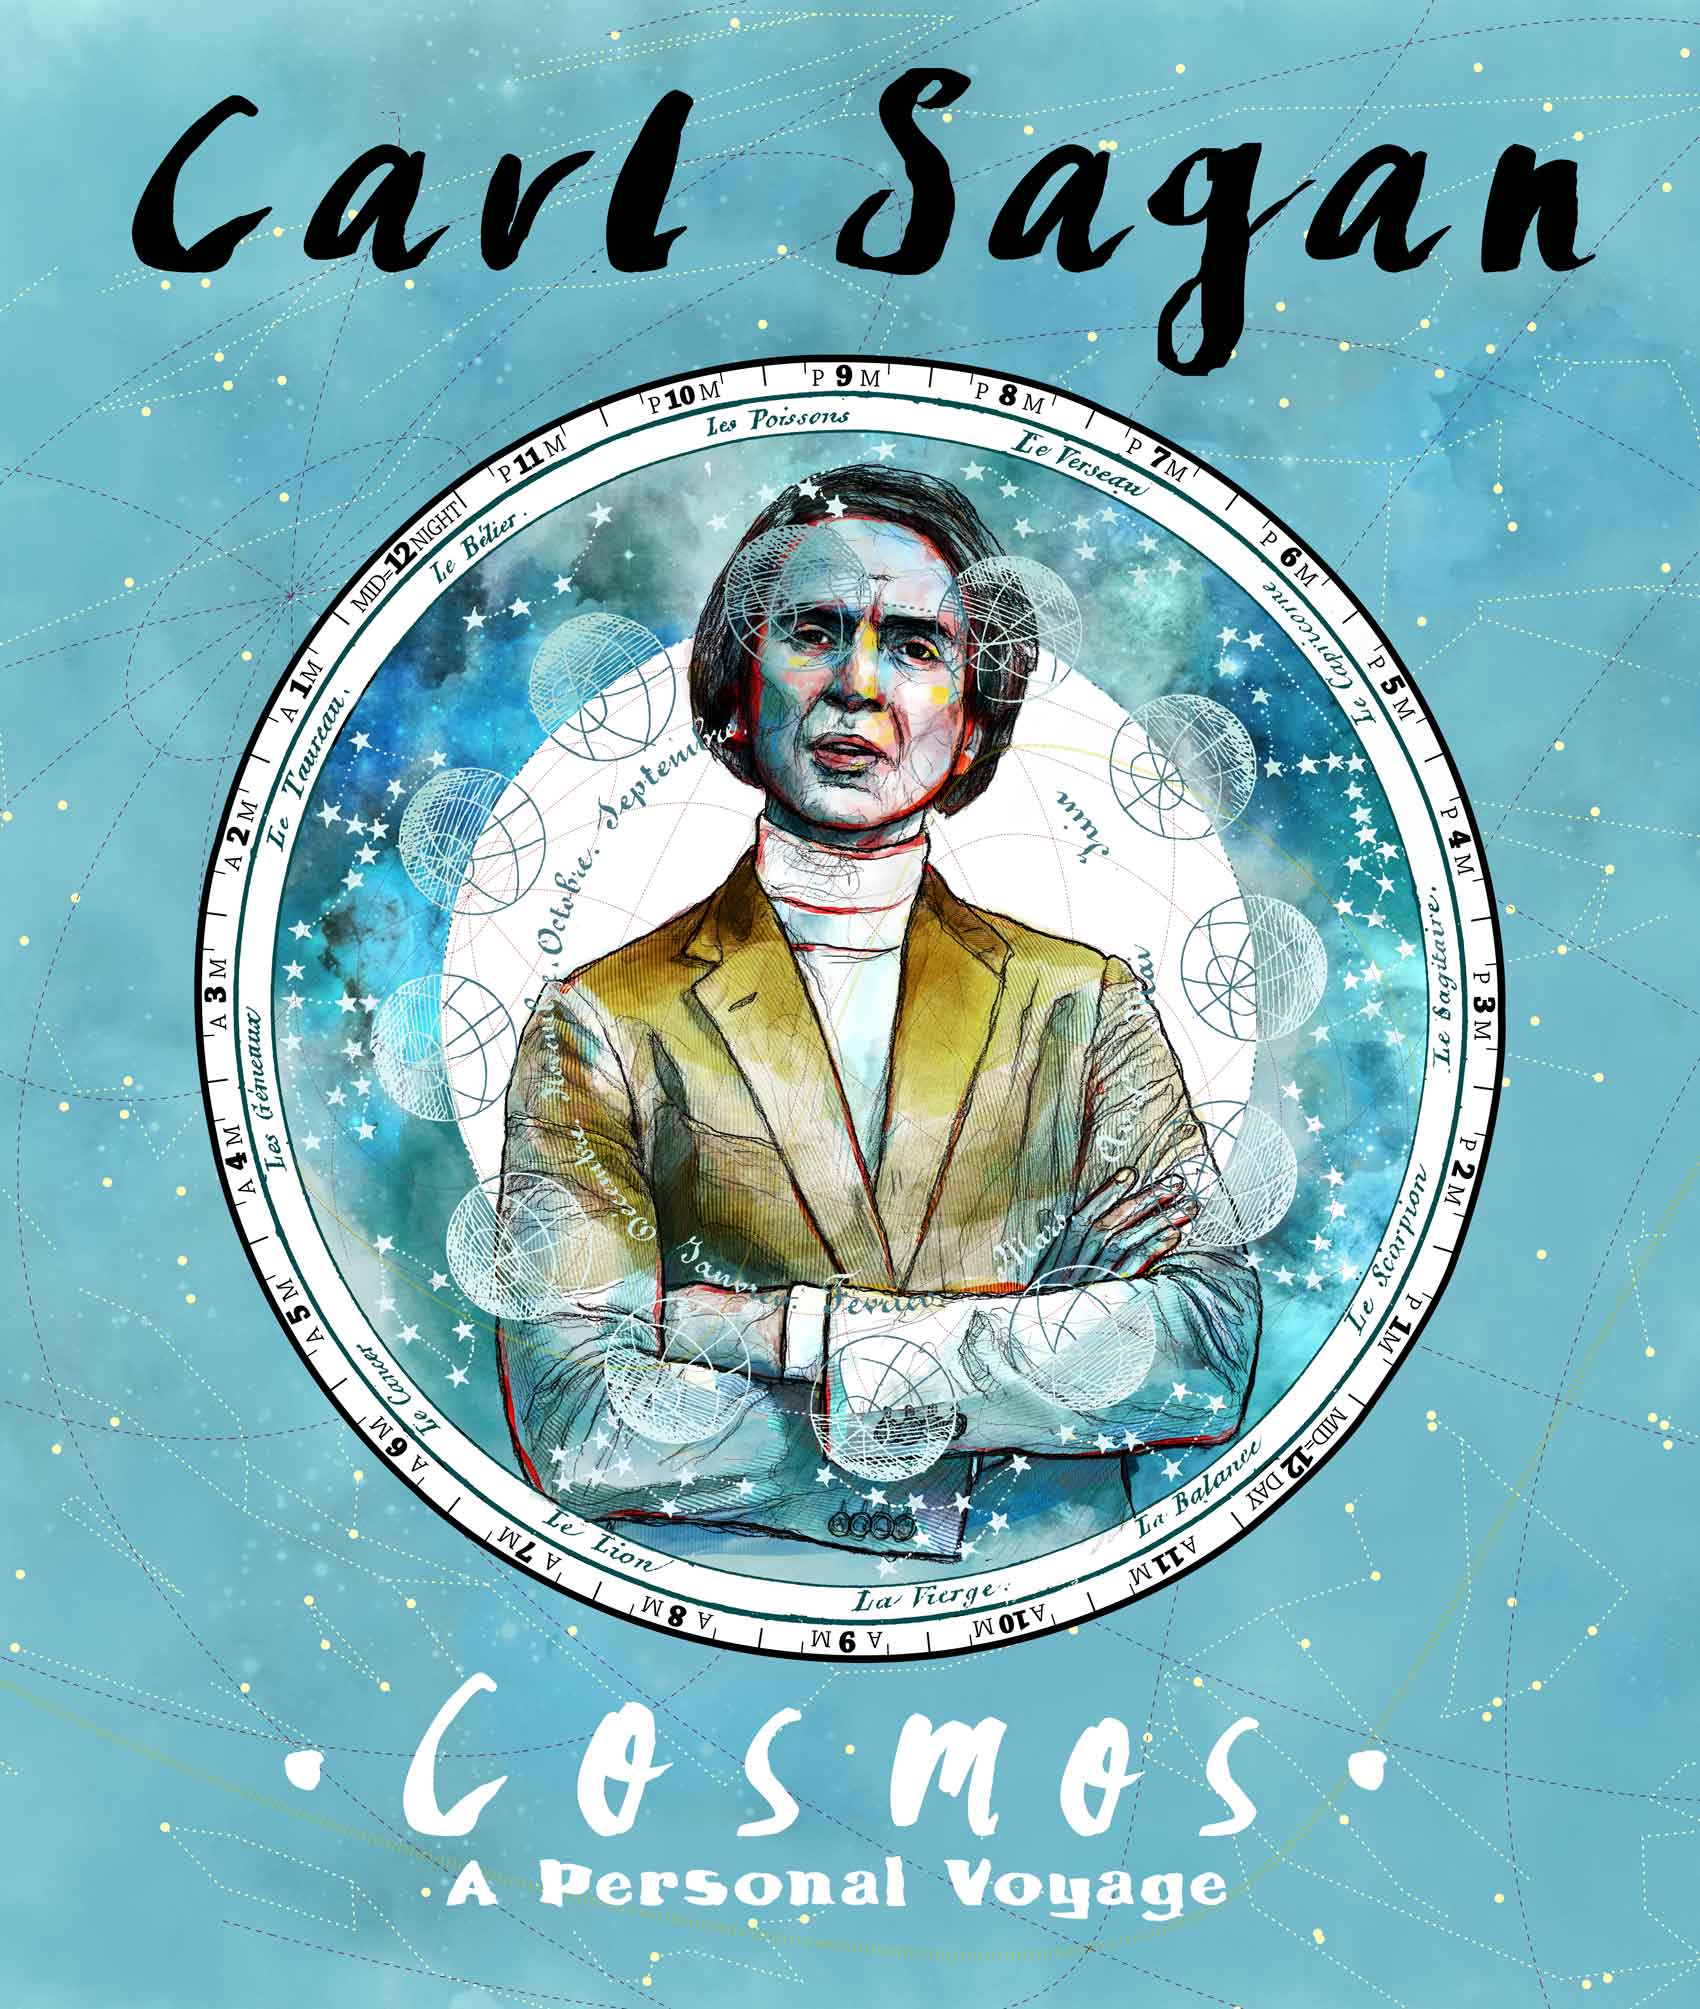 Mario Jodra illustration Art - Carl Sagan Portrait